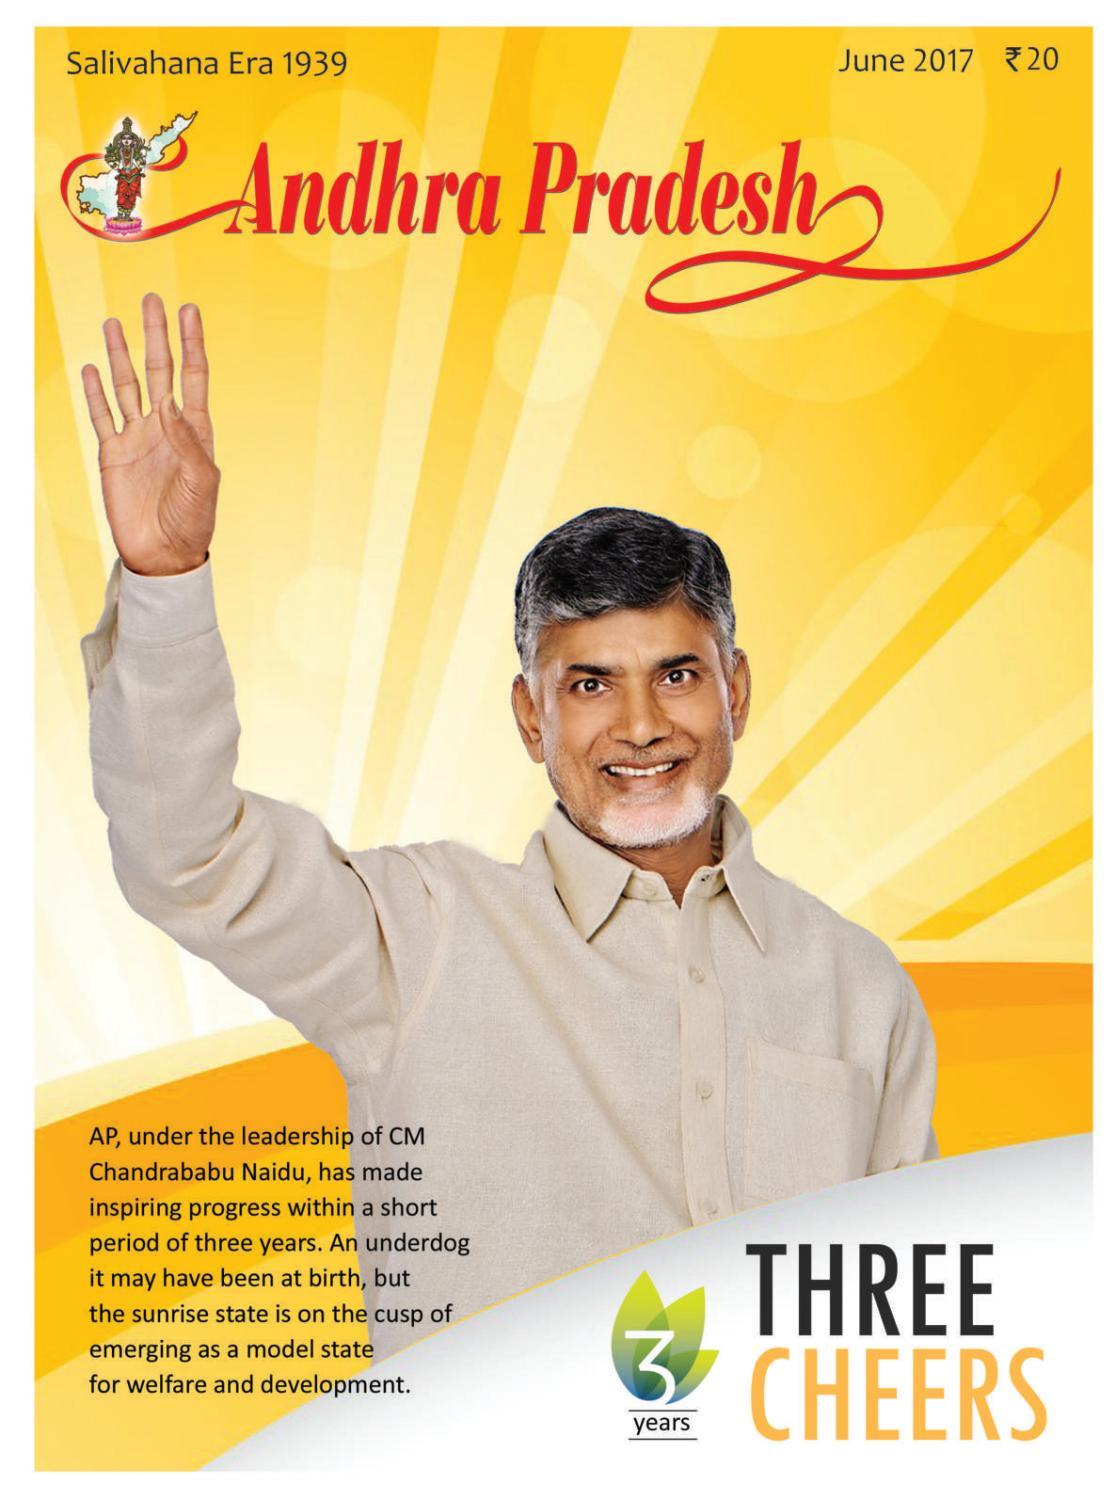 Andhra Pradesh Eng June 2017 by Ramesh Kandula - issuu